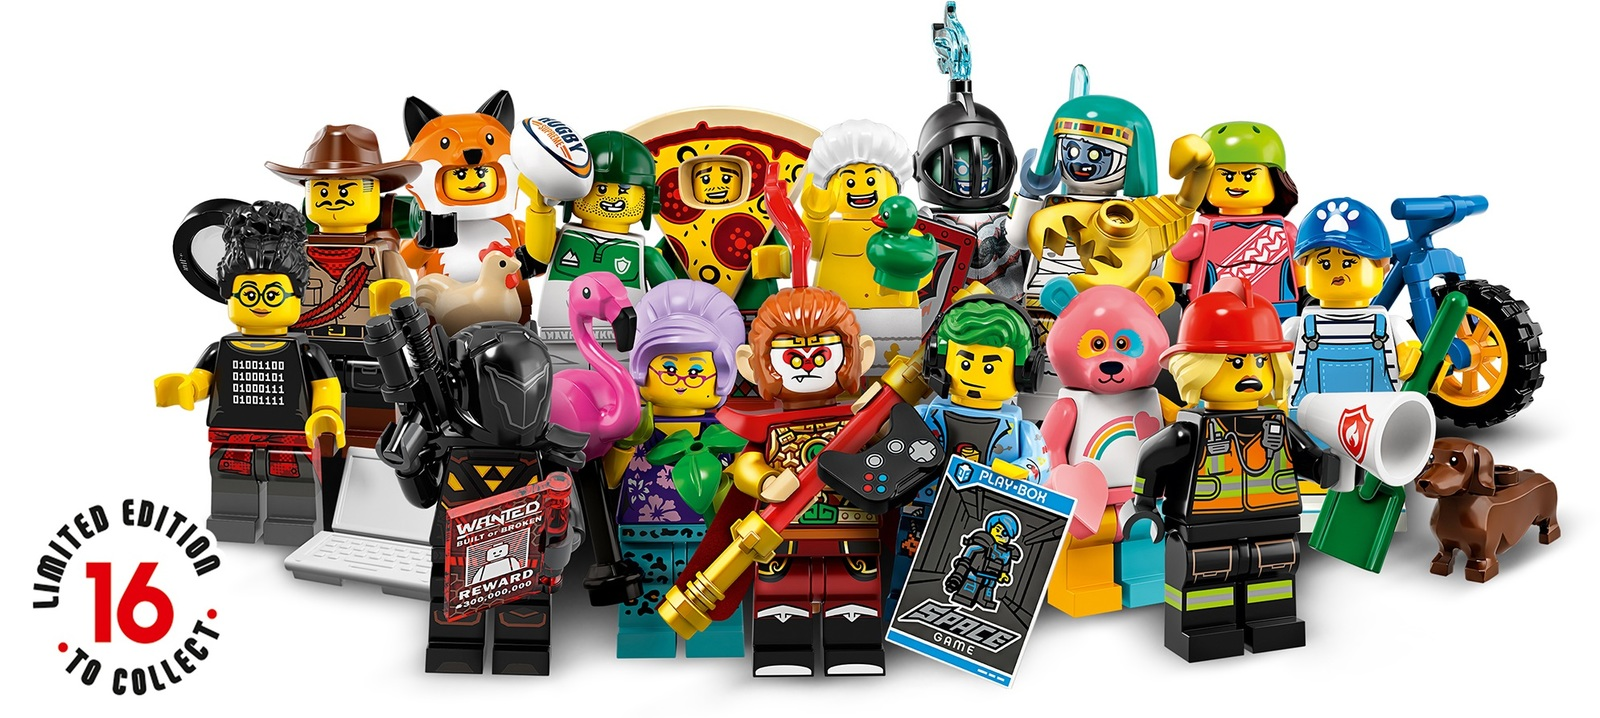 LEGO Minifigures - Series 19 (71025) image